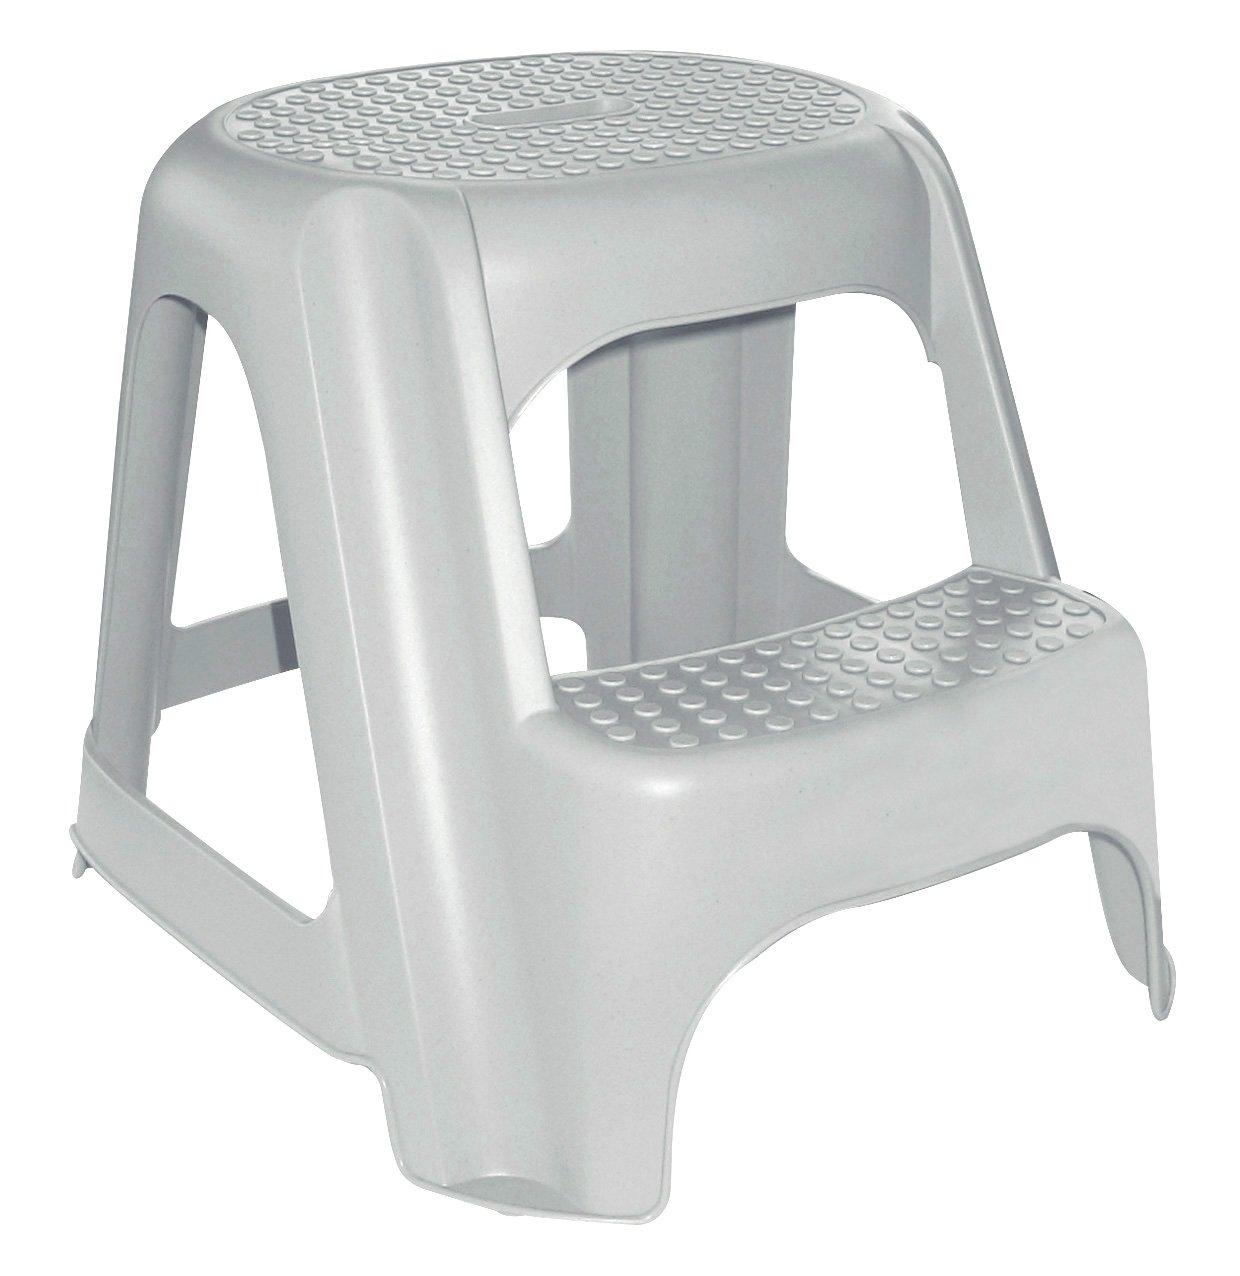 Allibert 191579 - step stools (Grey, Monotone)